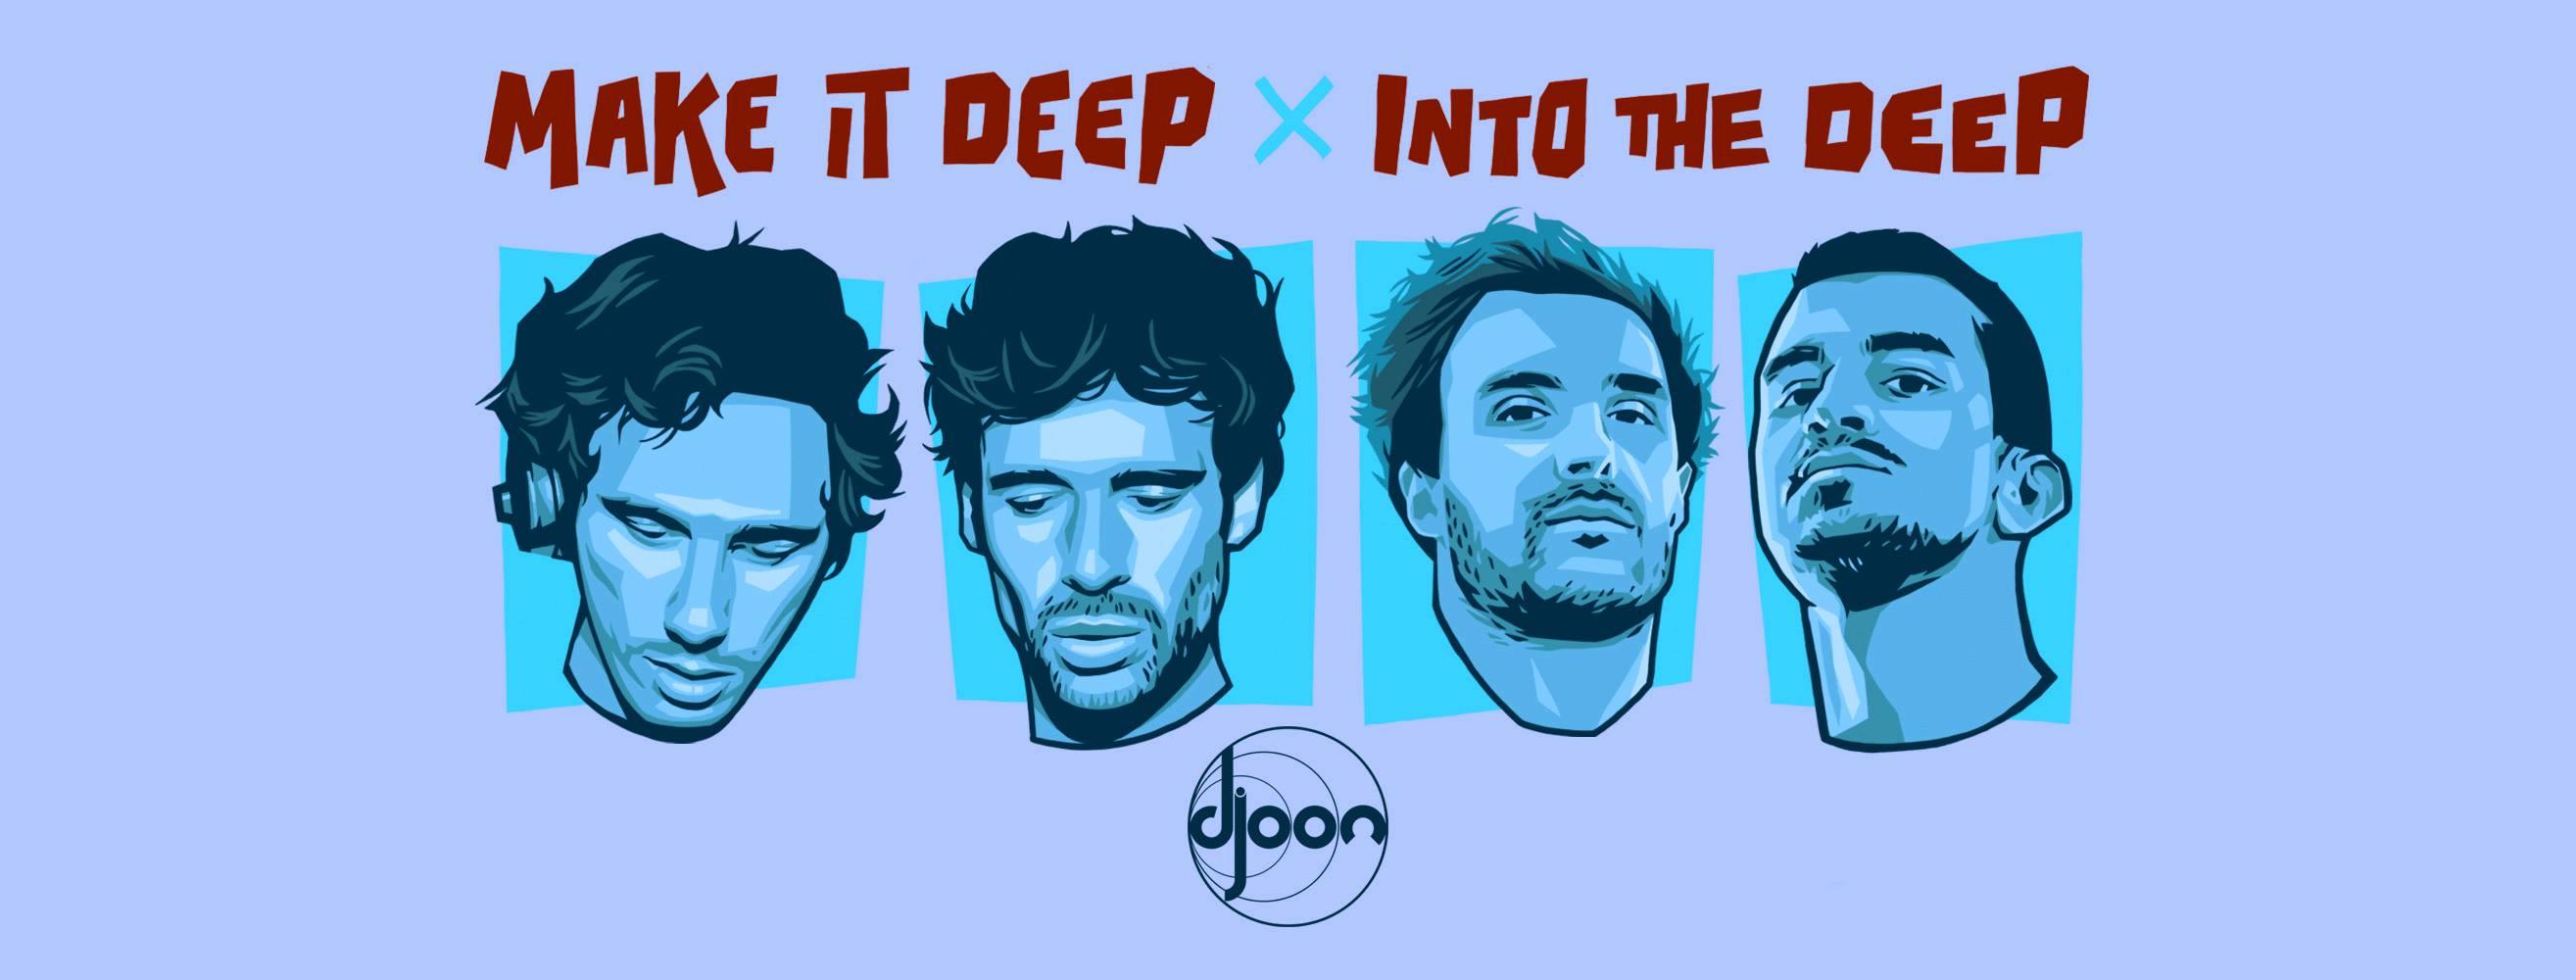 Djoon: Make It Deep x Into The Deep (all night long)